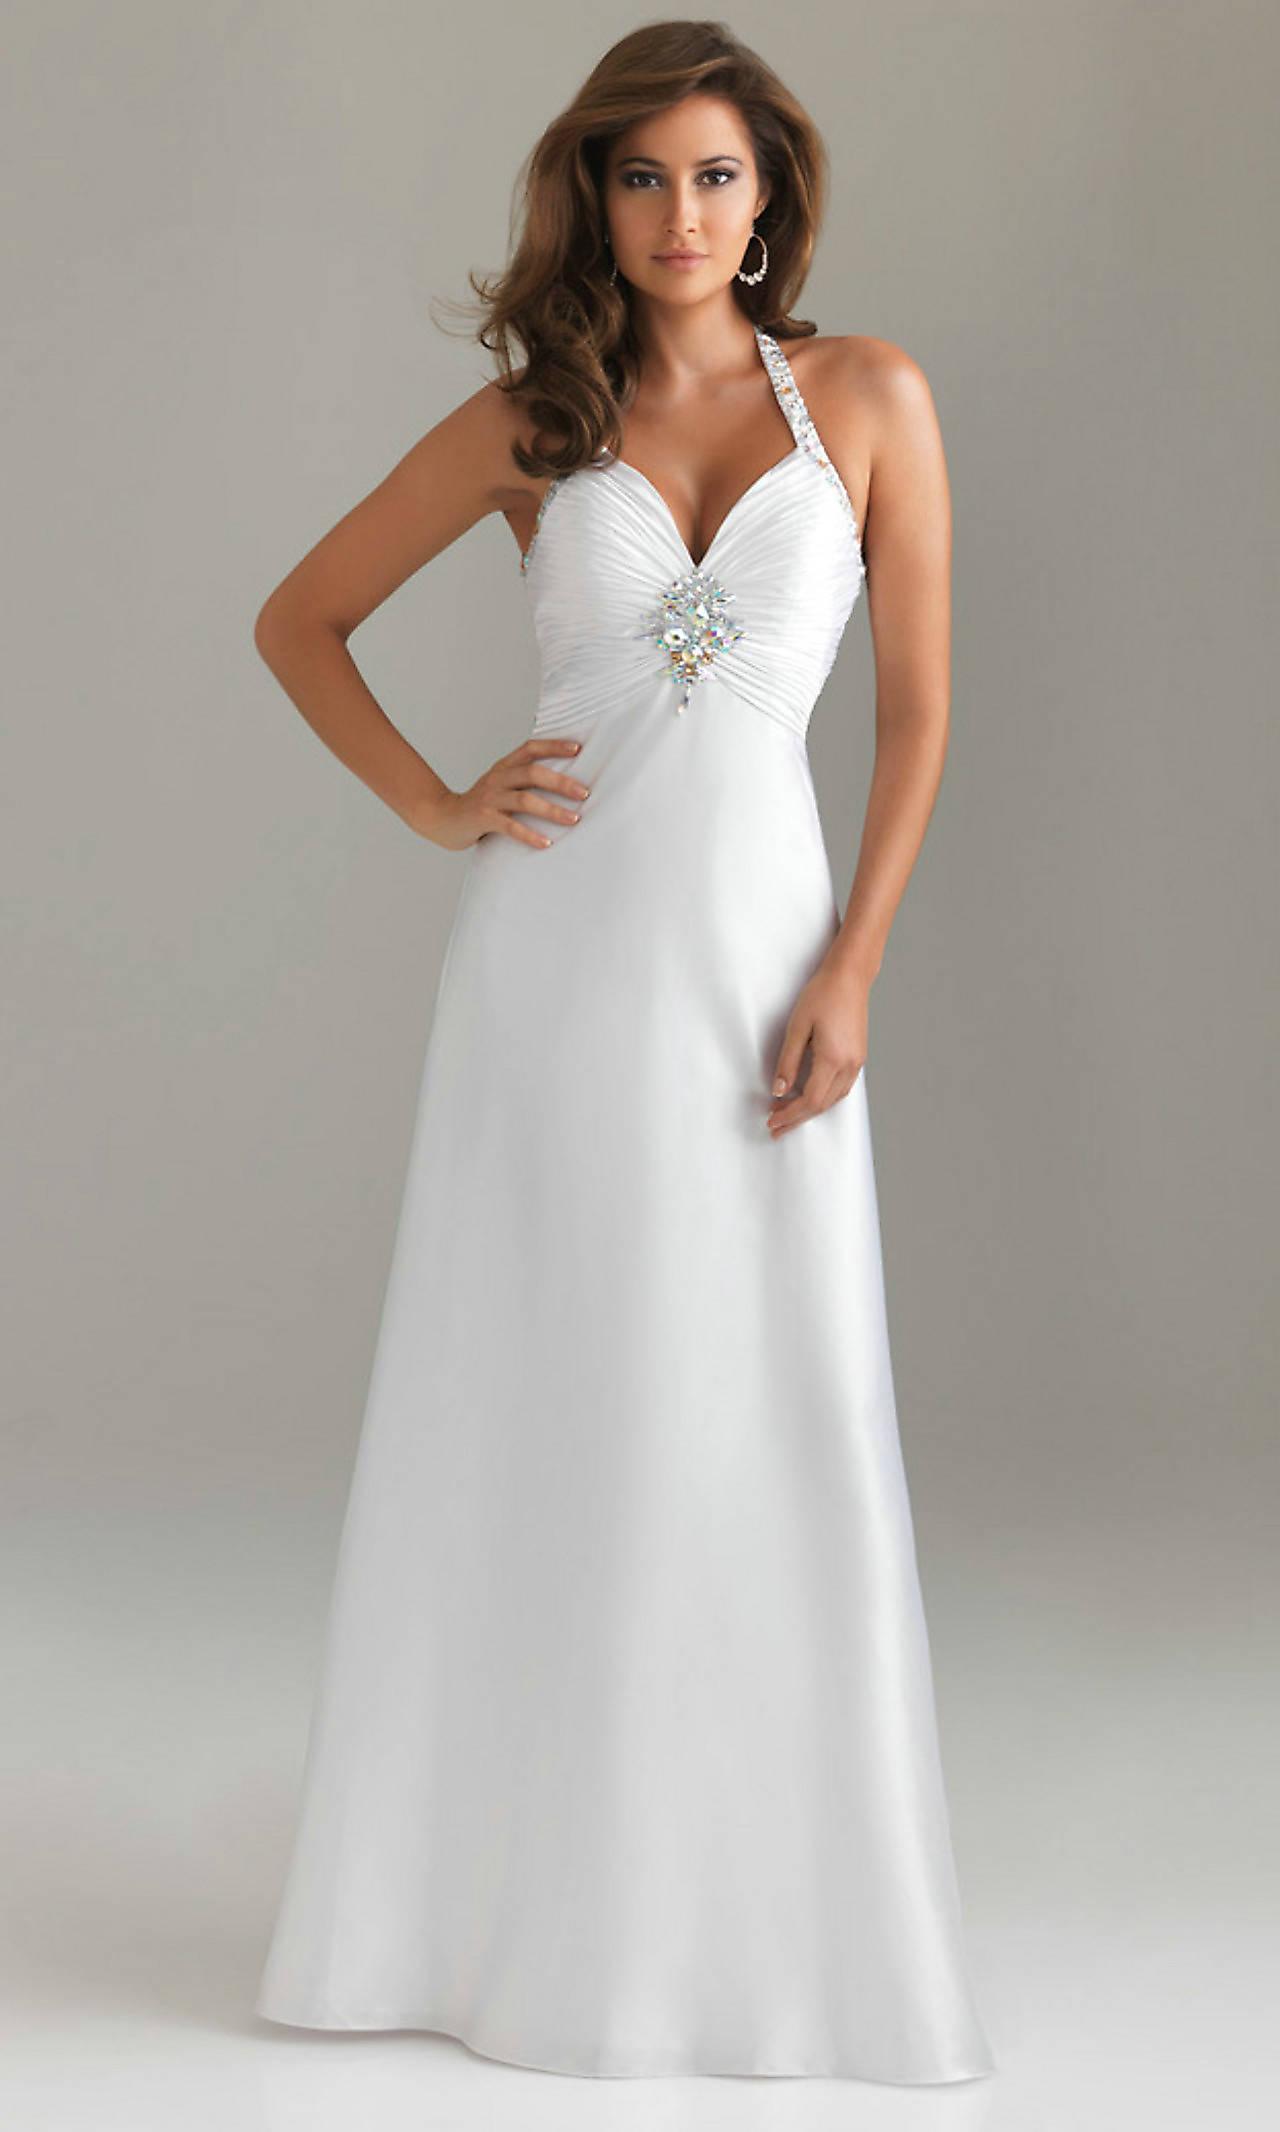 20 Beautiful White Prom Dresses